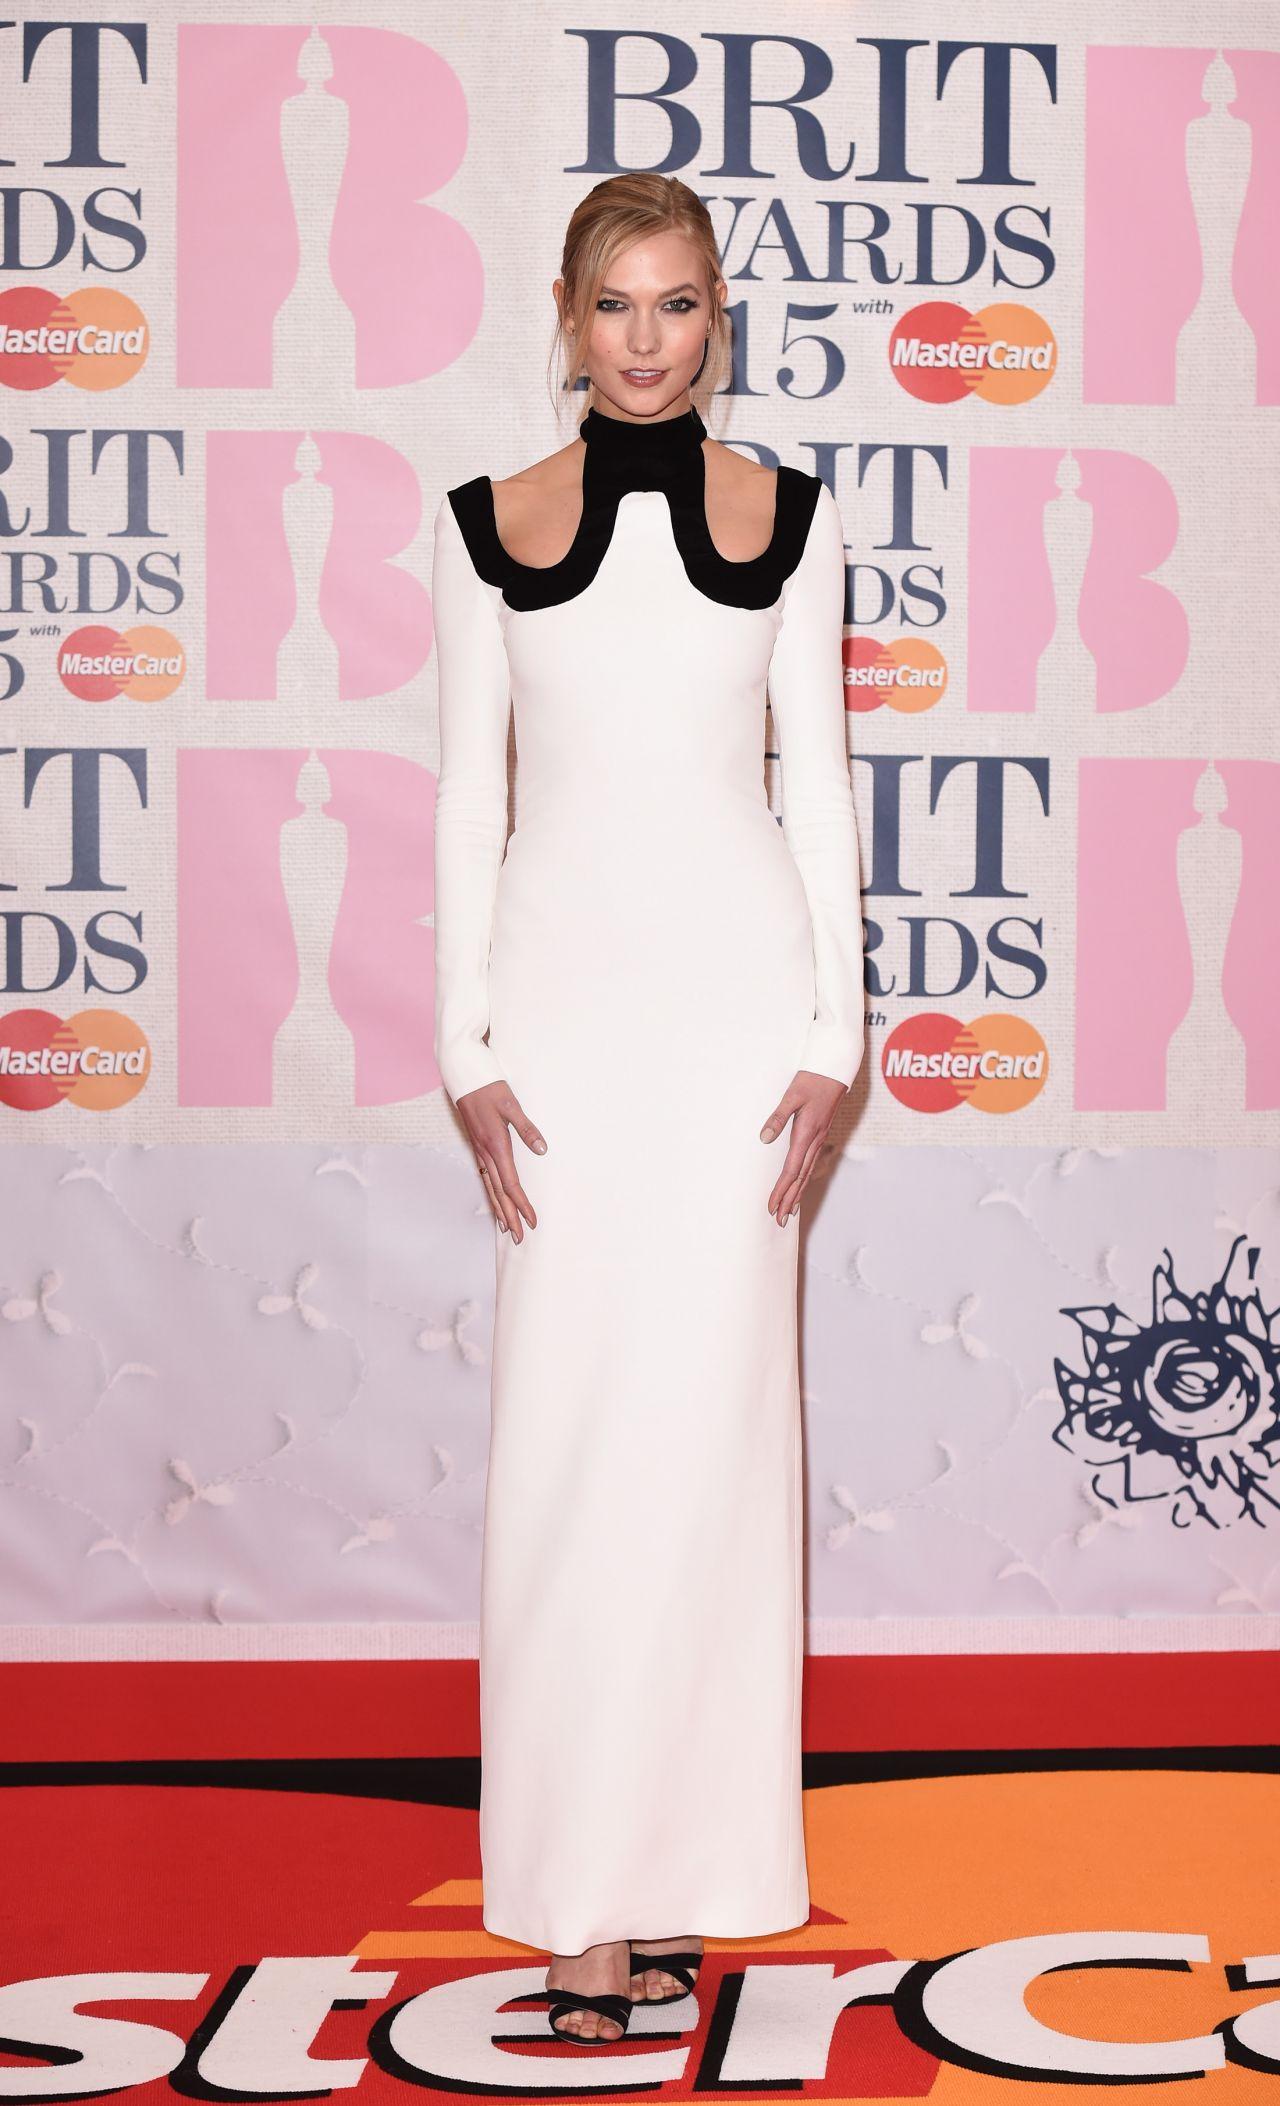 karlie-kloss-2015-brit-awards-in-london_4